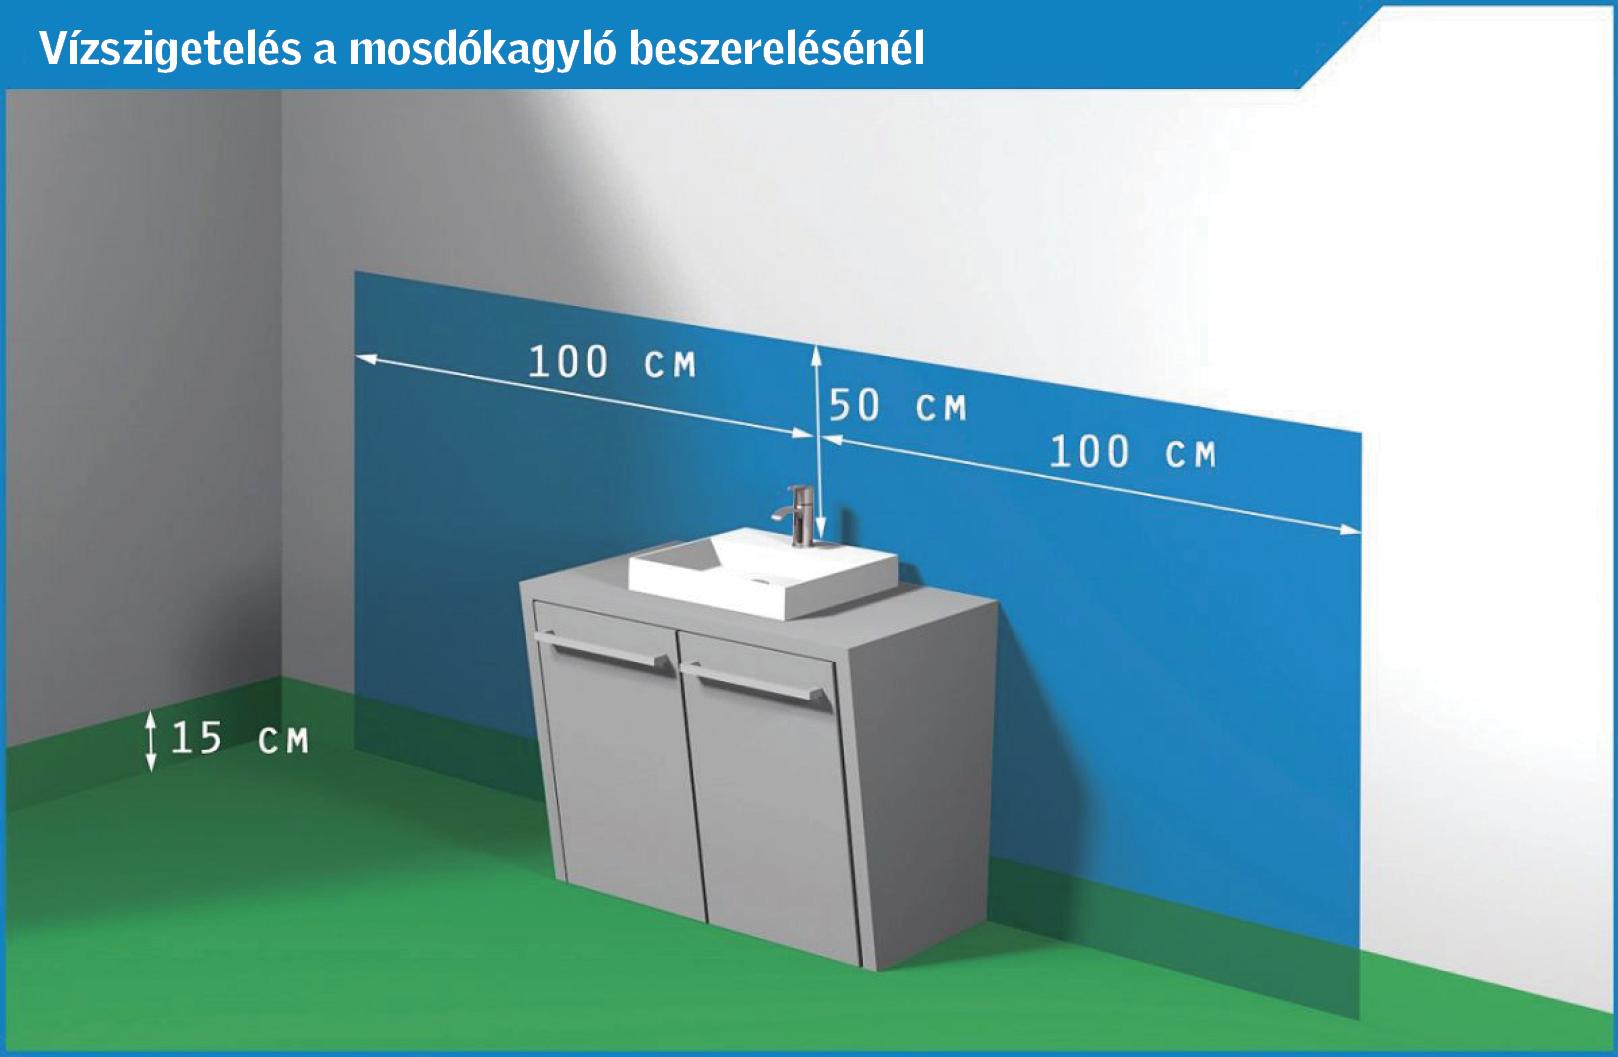 hirek/2021/aprilis/11/lebada-3-magyar.jpg